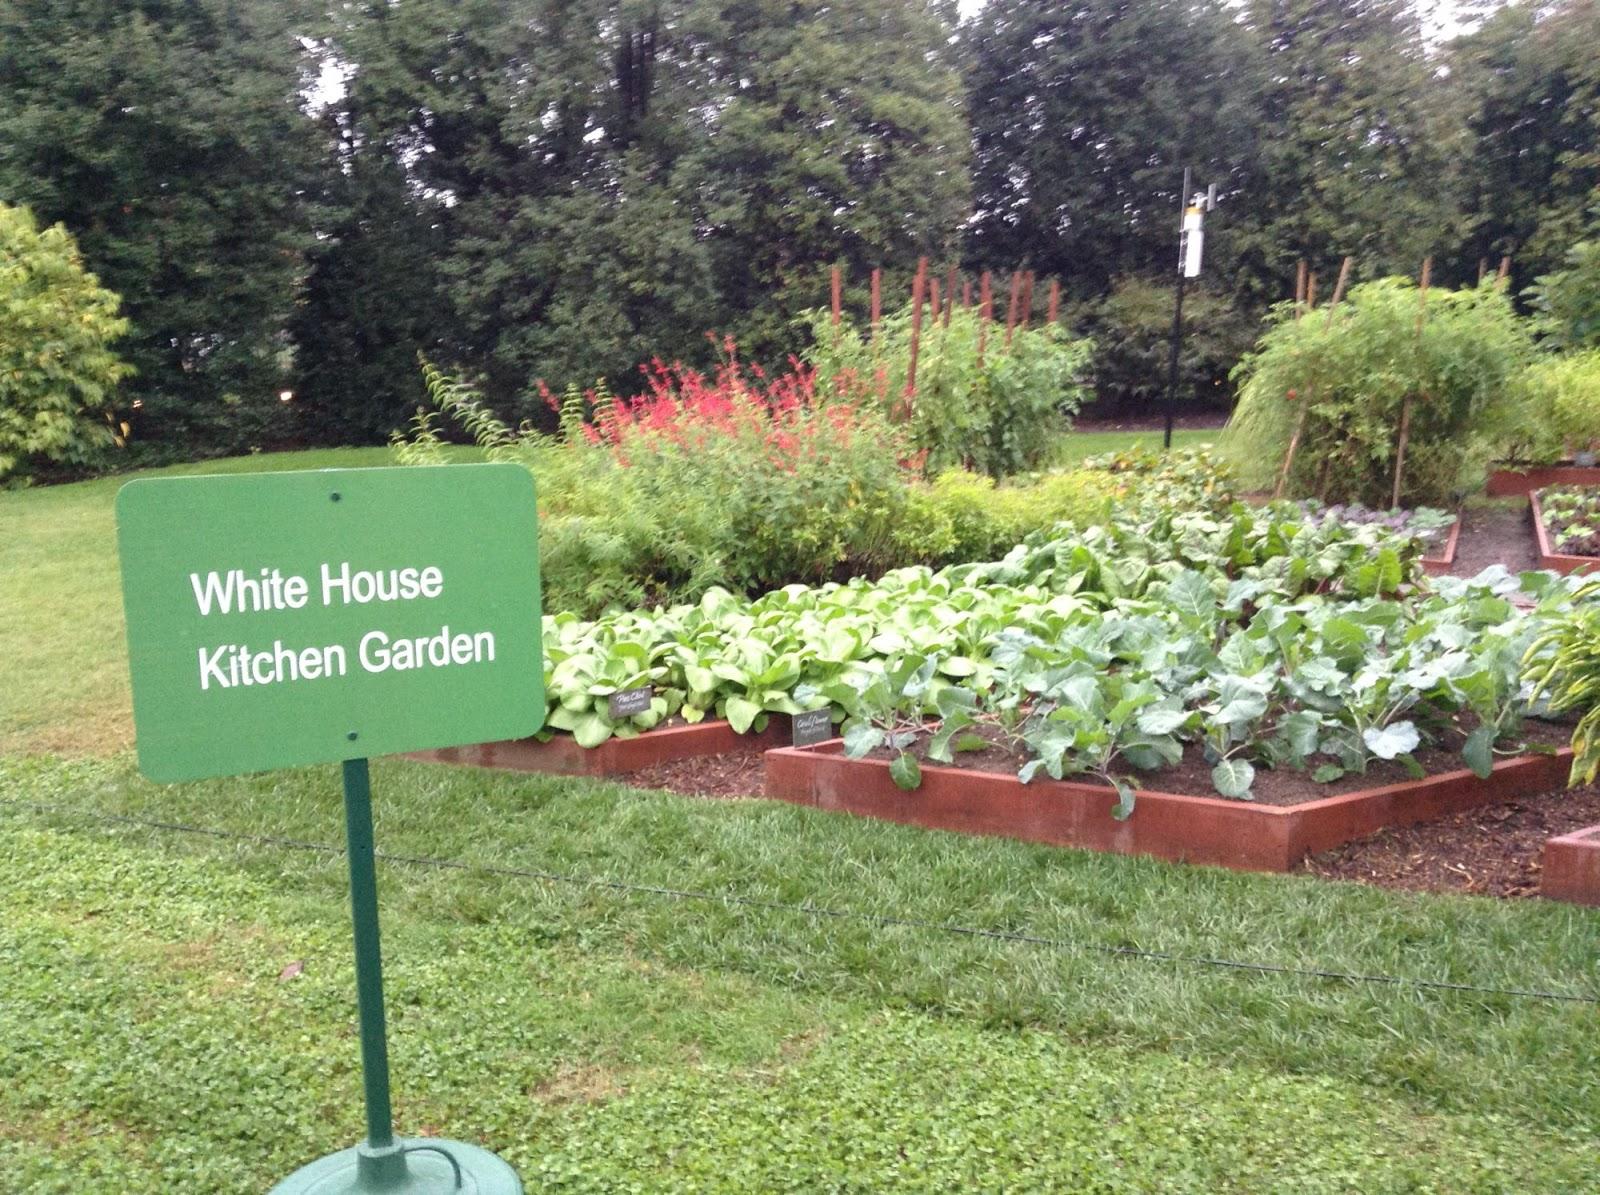 My Homemade Iowa Life: White House fall garden tour